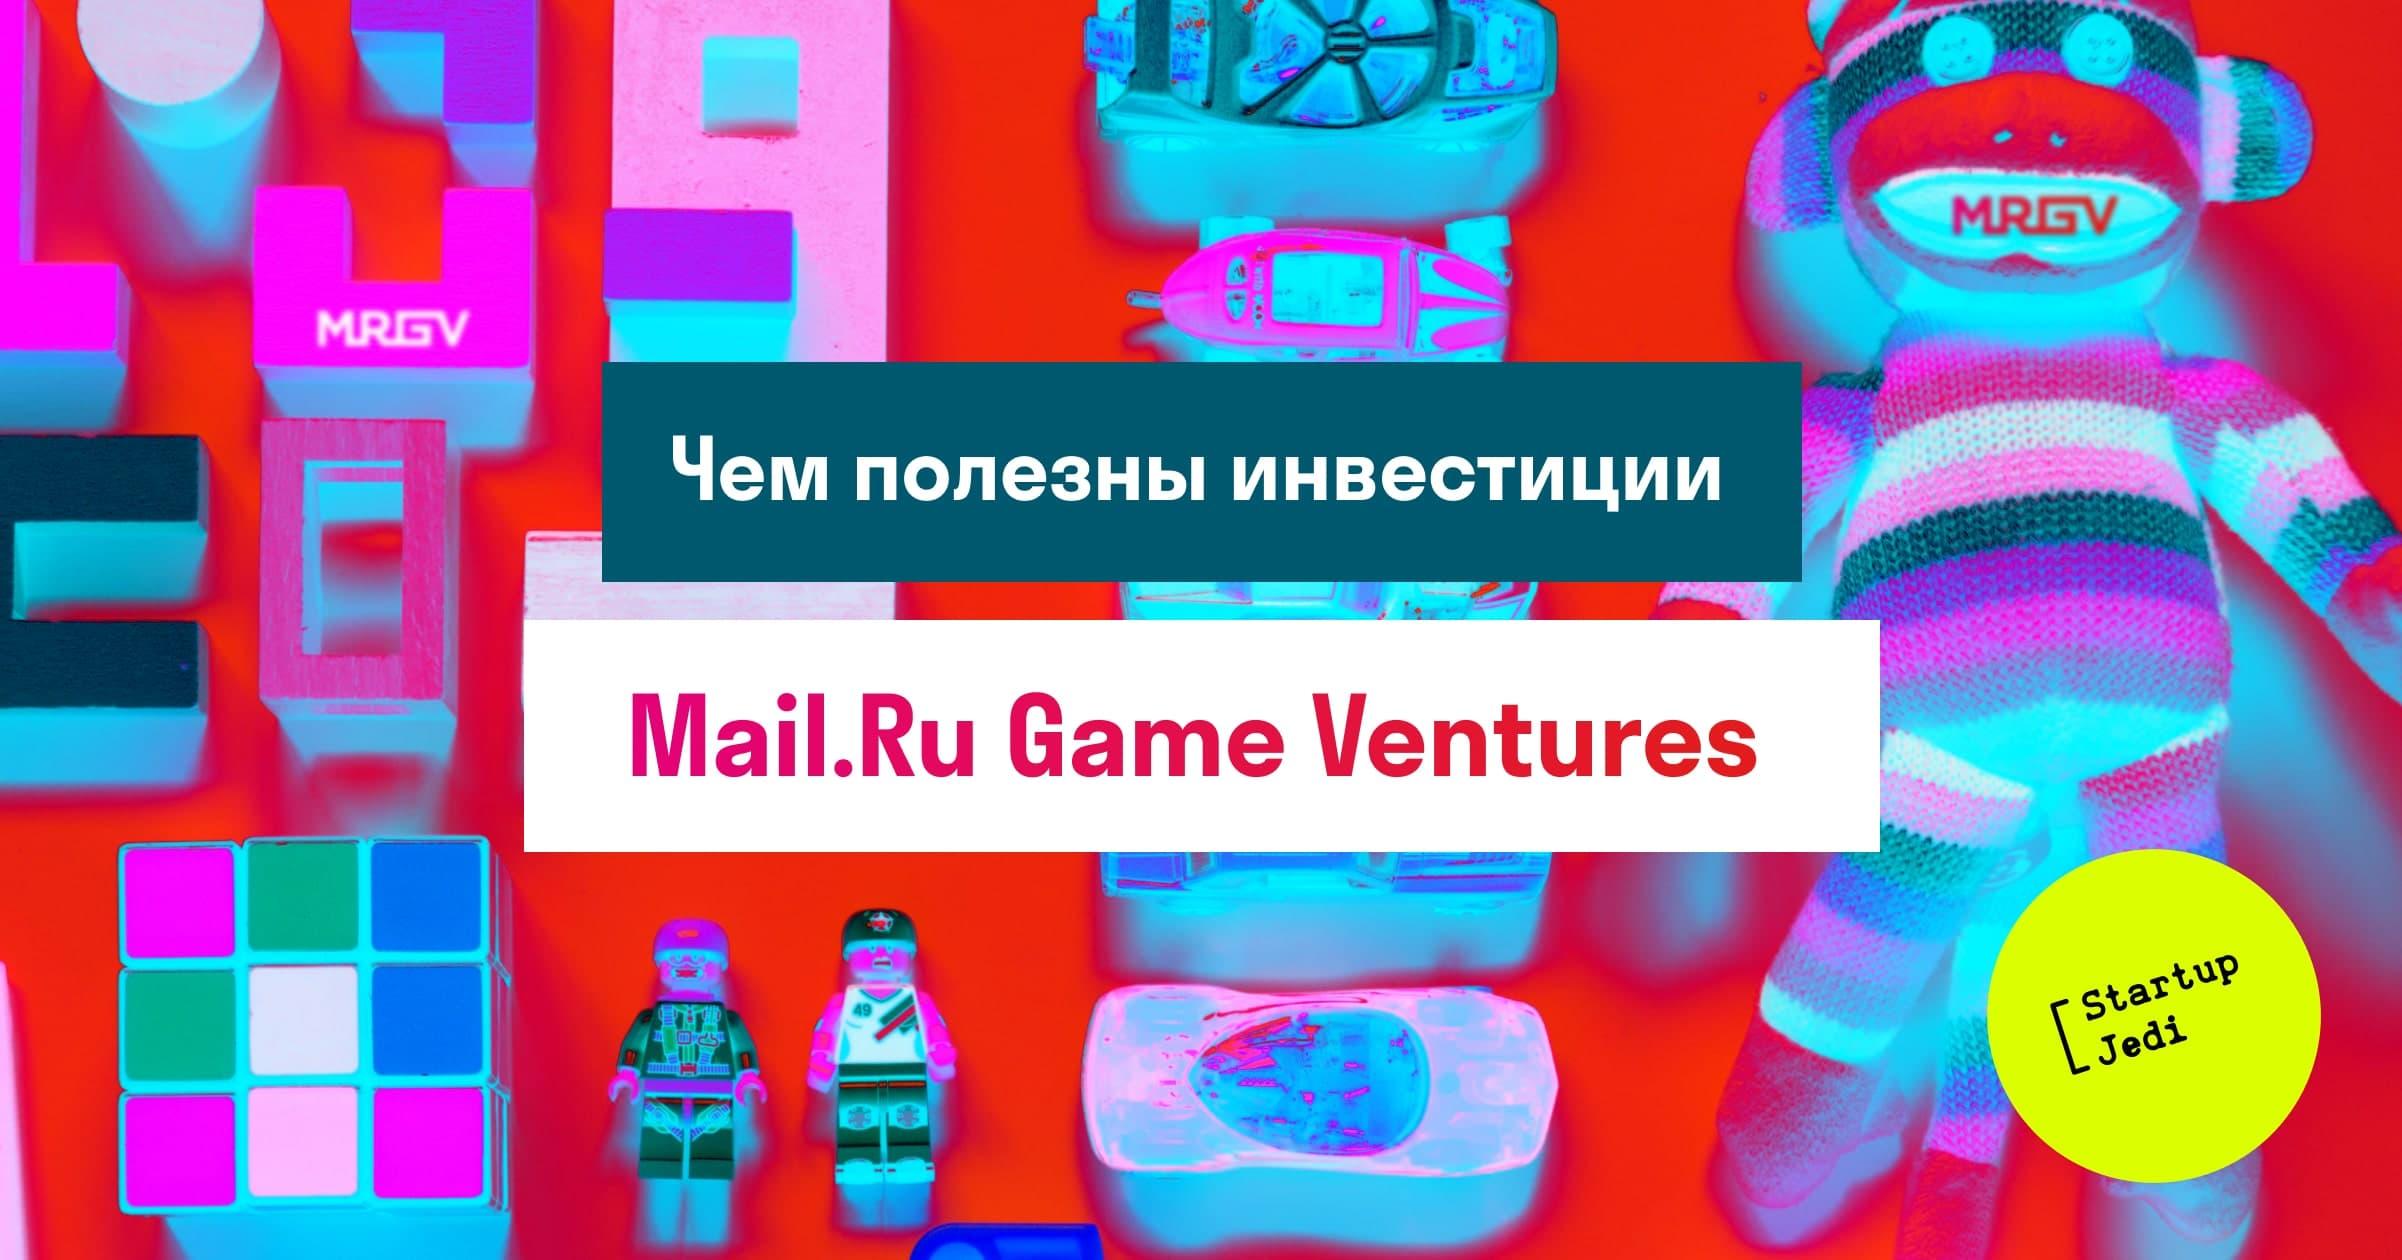 Mail.Ru Game Ventures